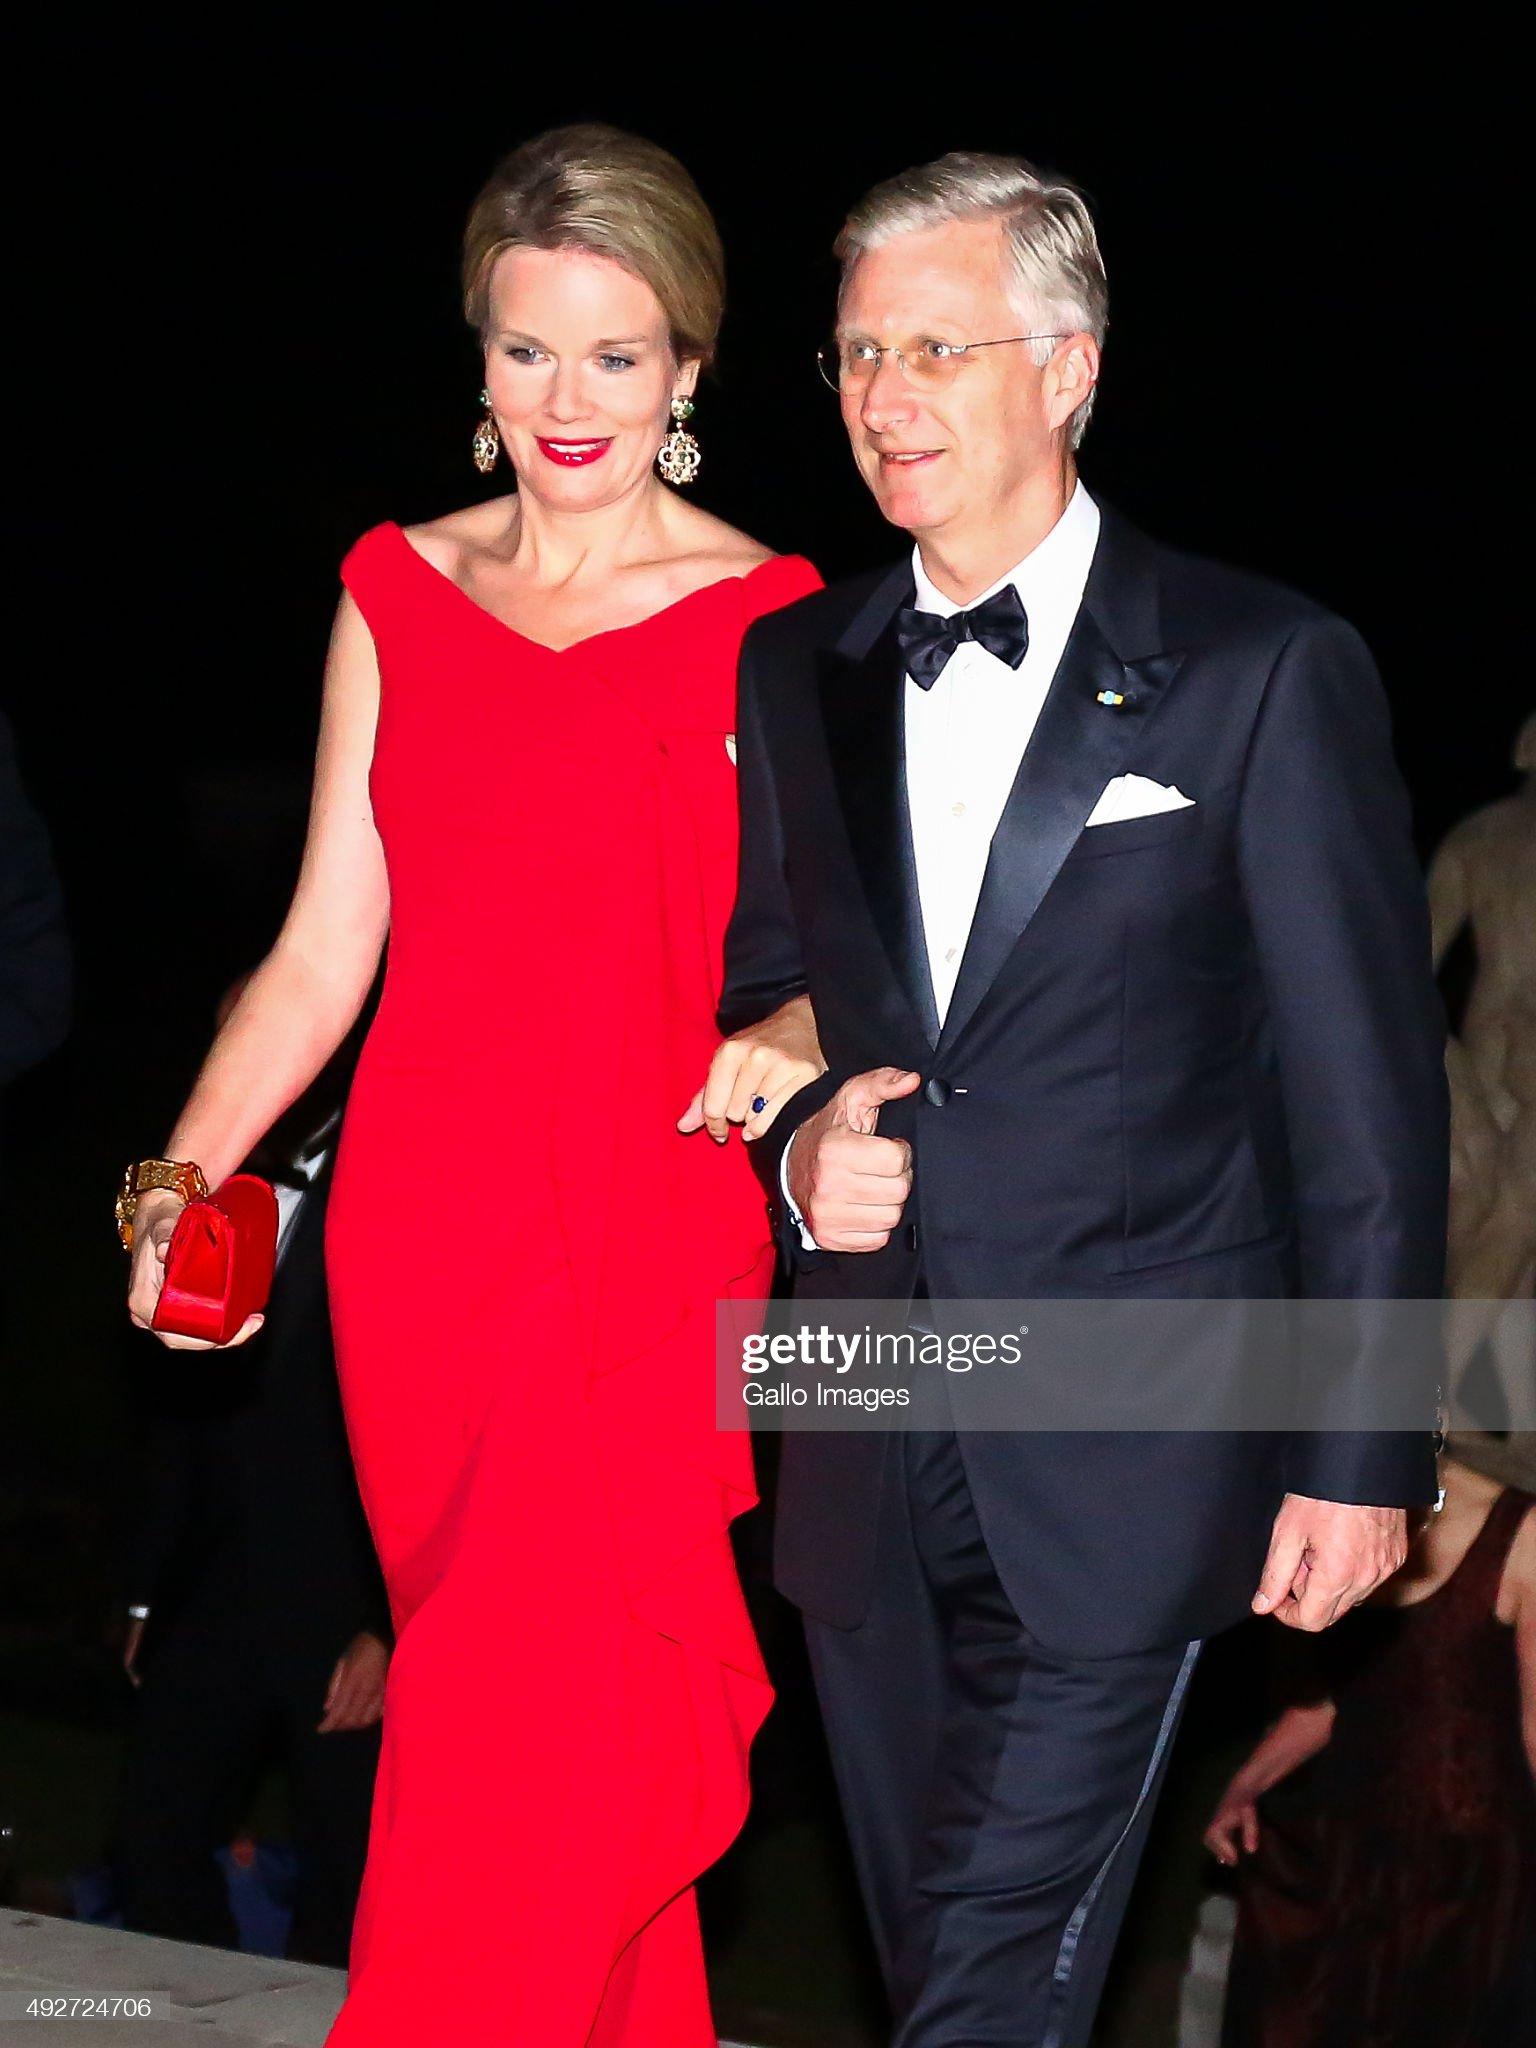 Вечерние наряды Королевы Матильды King Philippe and Queen Mathilde host Reception Dinner : News Photo